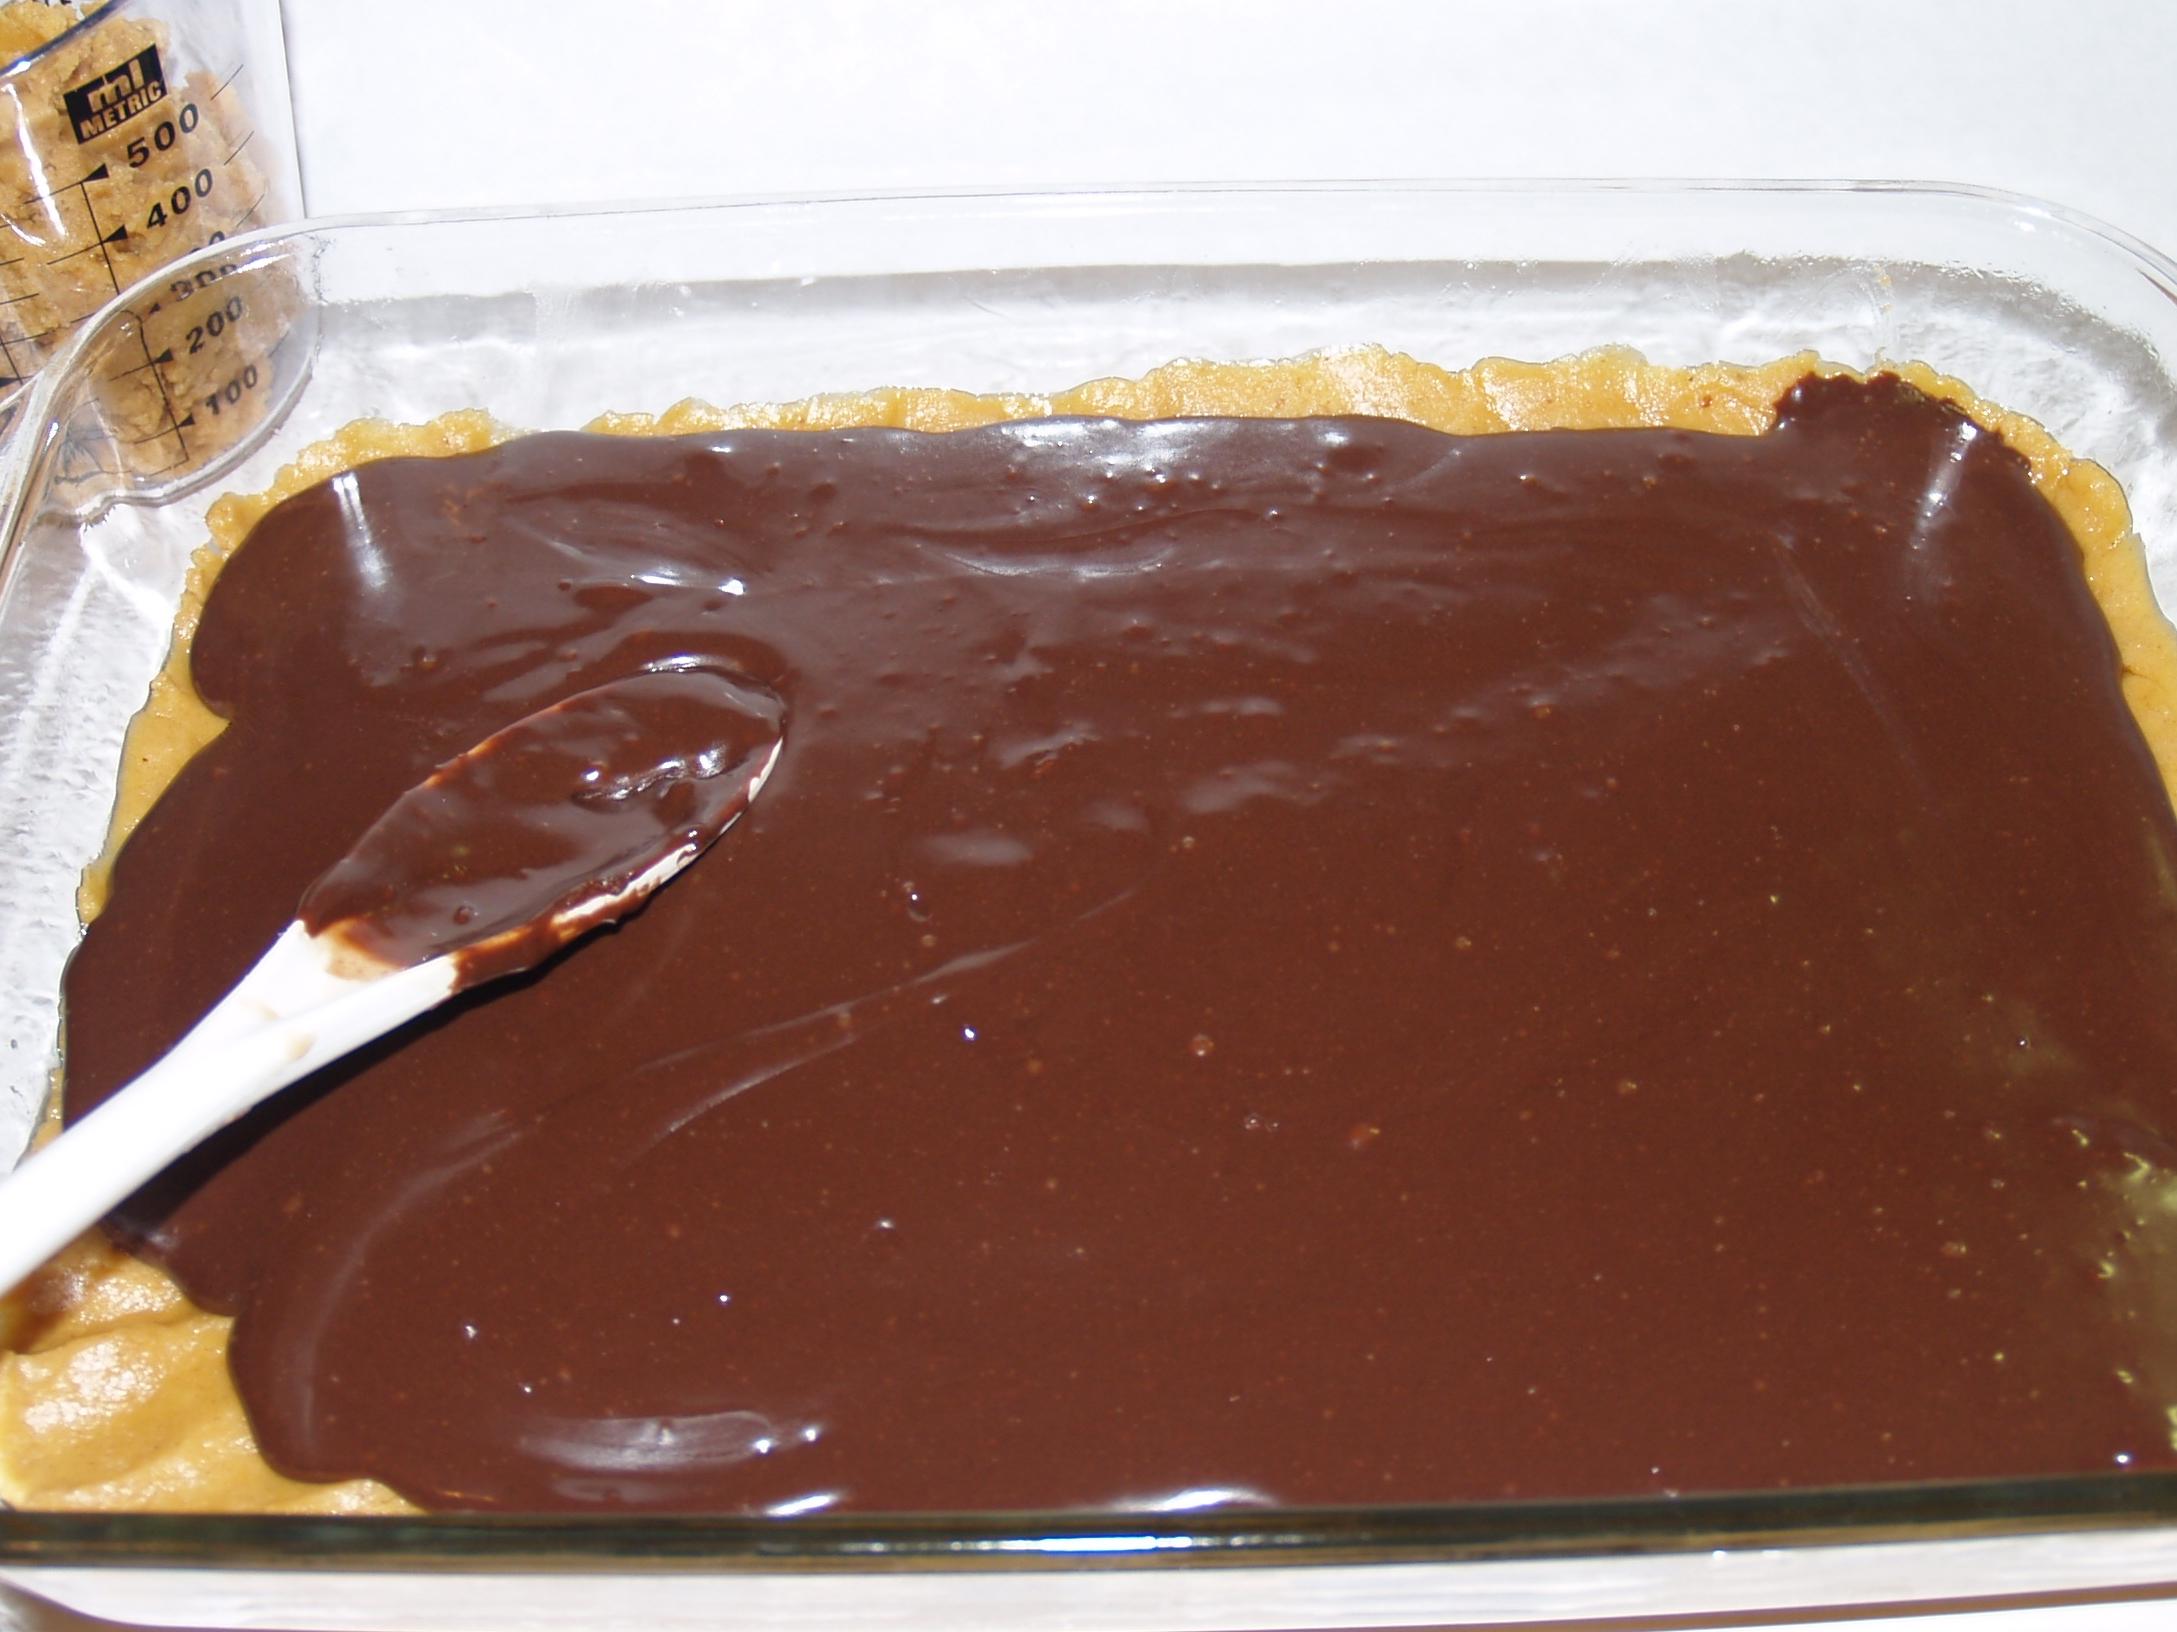 Chocolate Peanut Butter Banana Bars